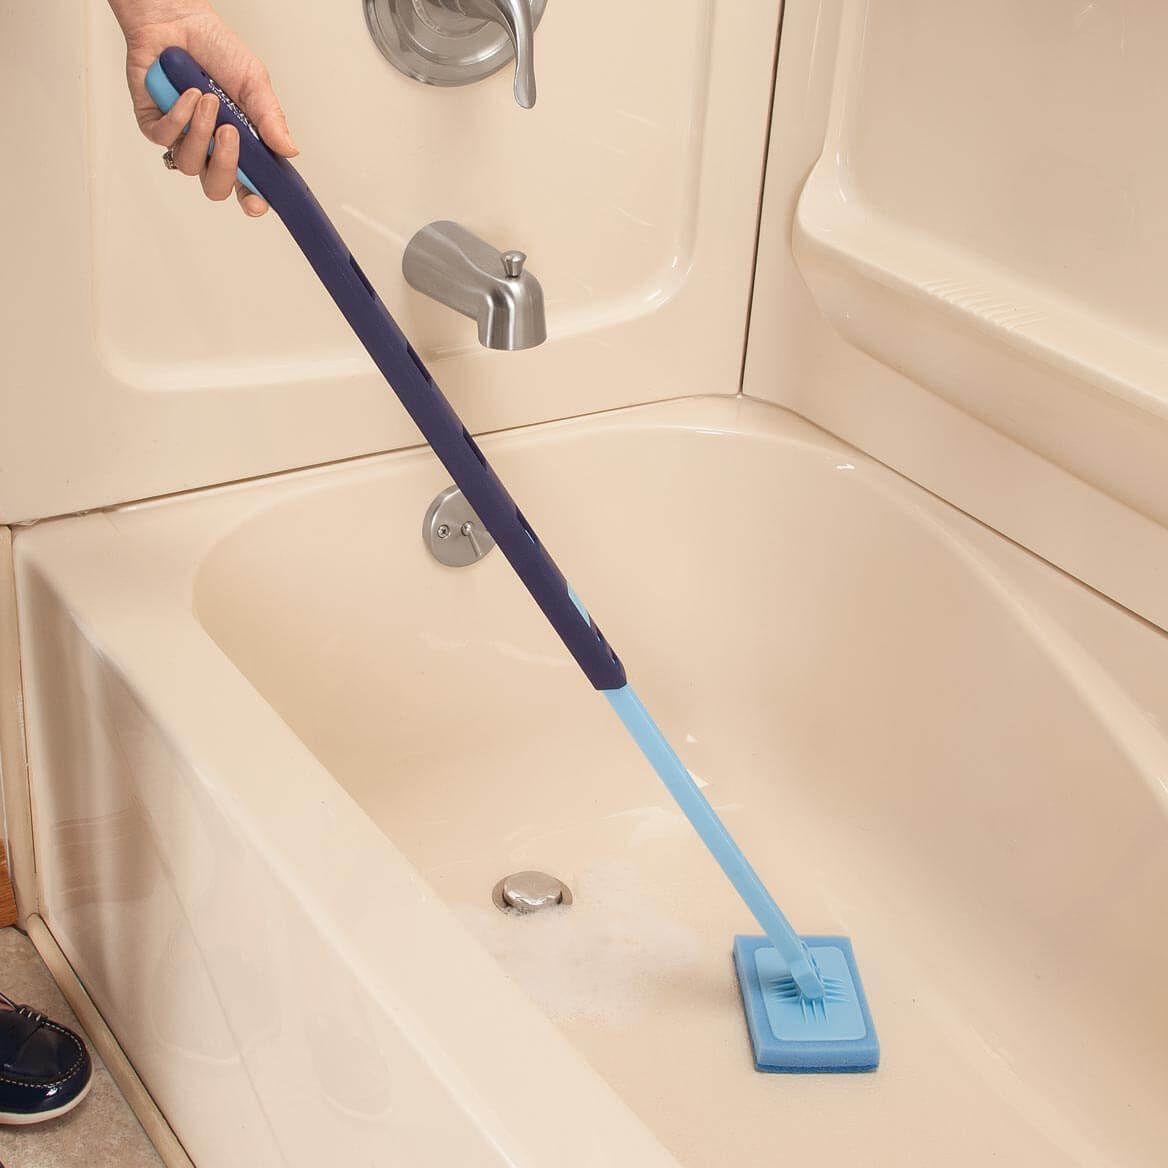 Microfiber Refill for Tub & Wall Scrubber-358583